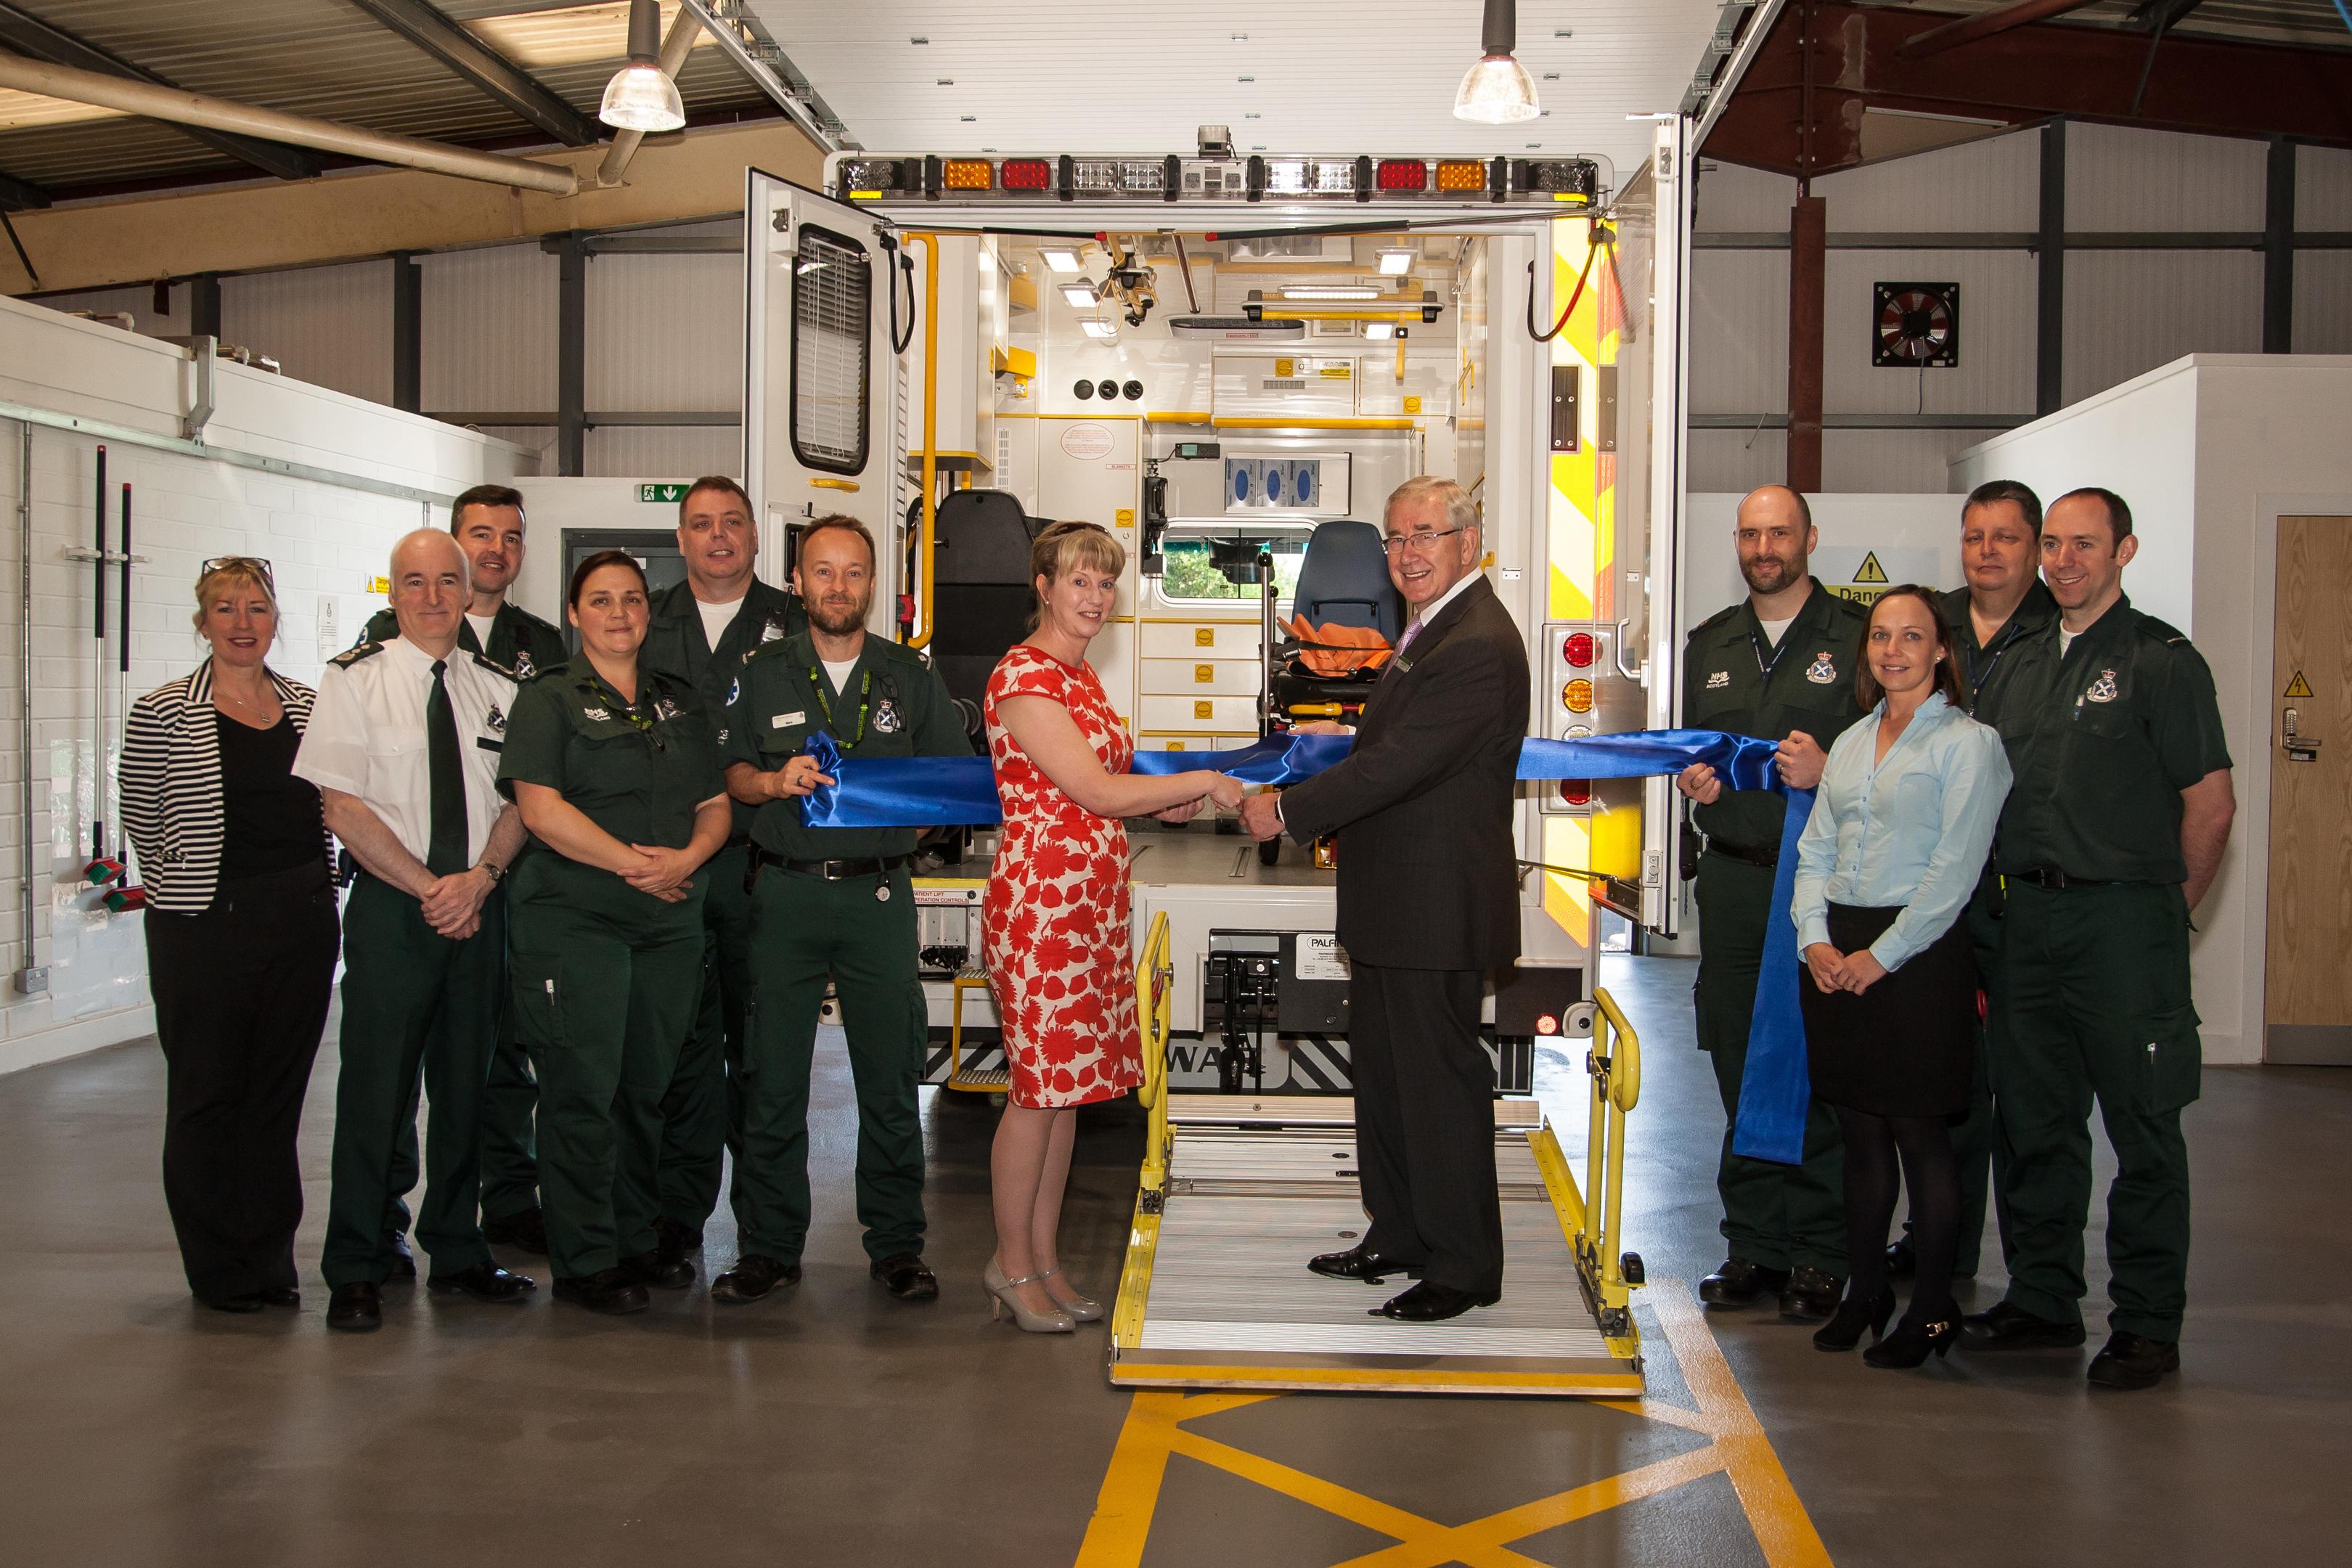 Shona Robison cutting the ribbon with David Garbutt, chairman Scottish Ambulance Service.